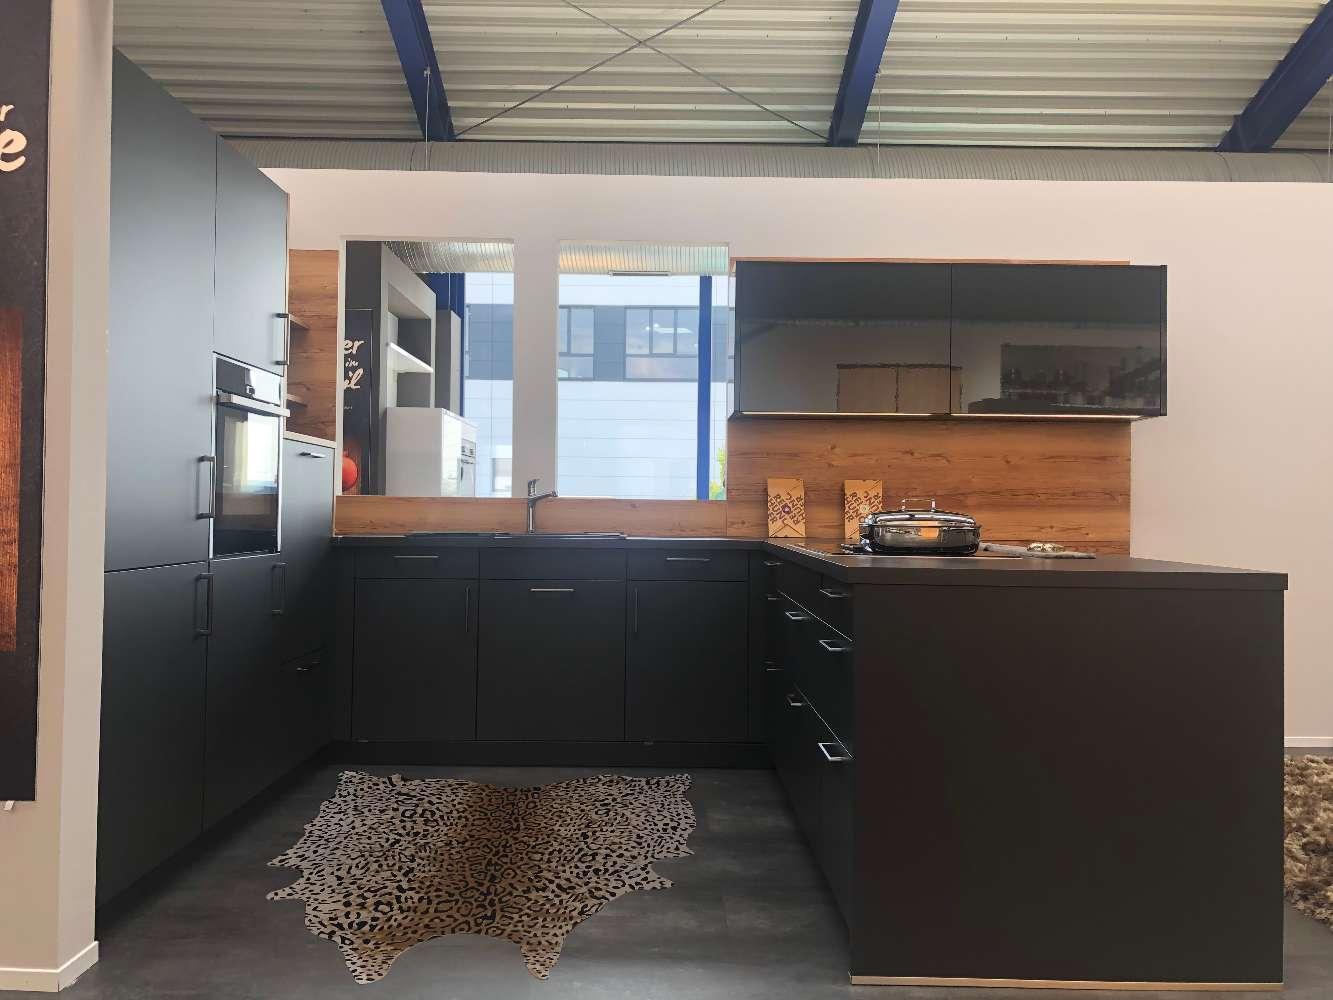 Full Size of Häcker Müllsystem Hcker Ausstellungskche Planungswelten Küche Wohnzimmer Häcker Müllsystem